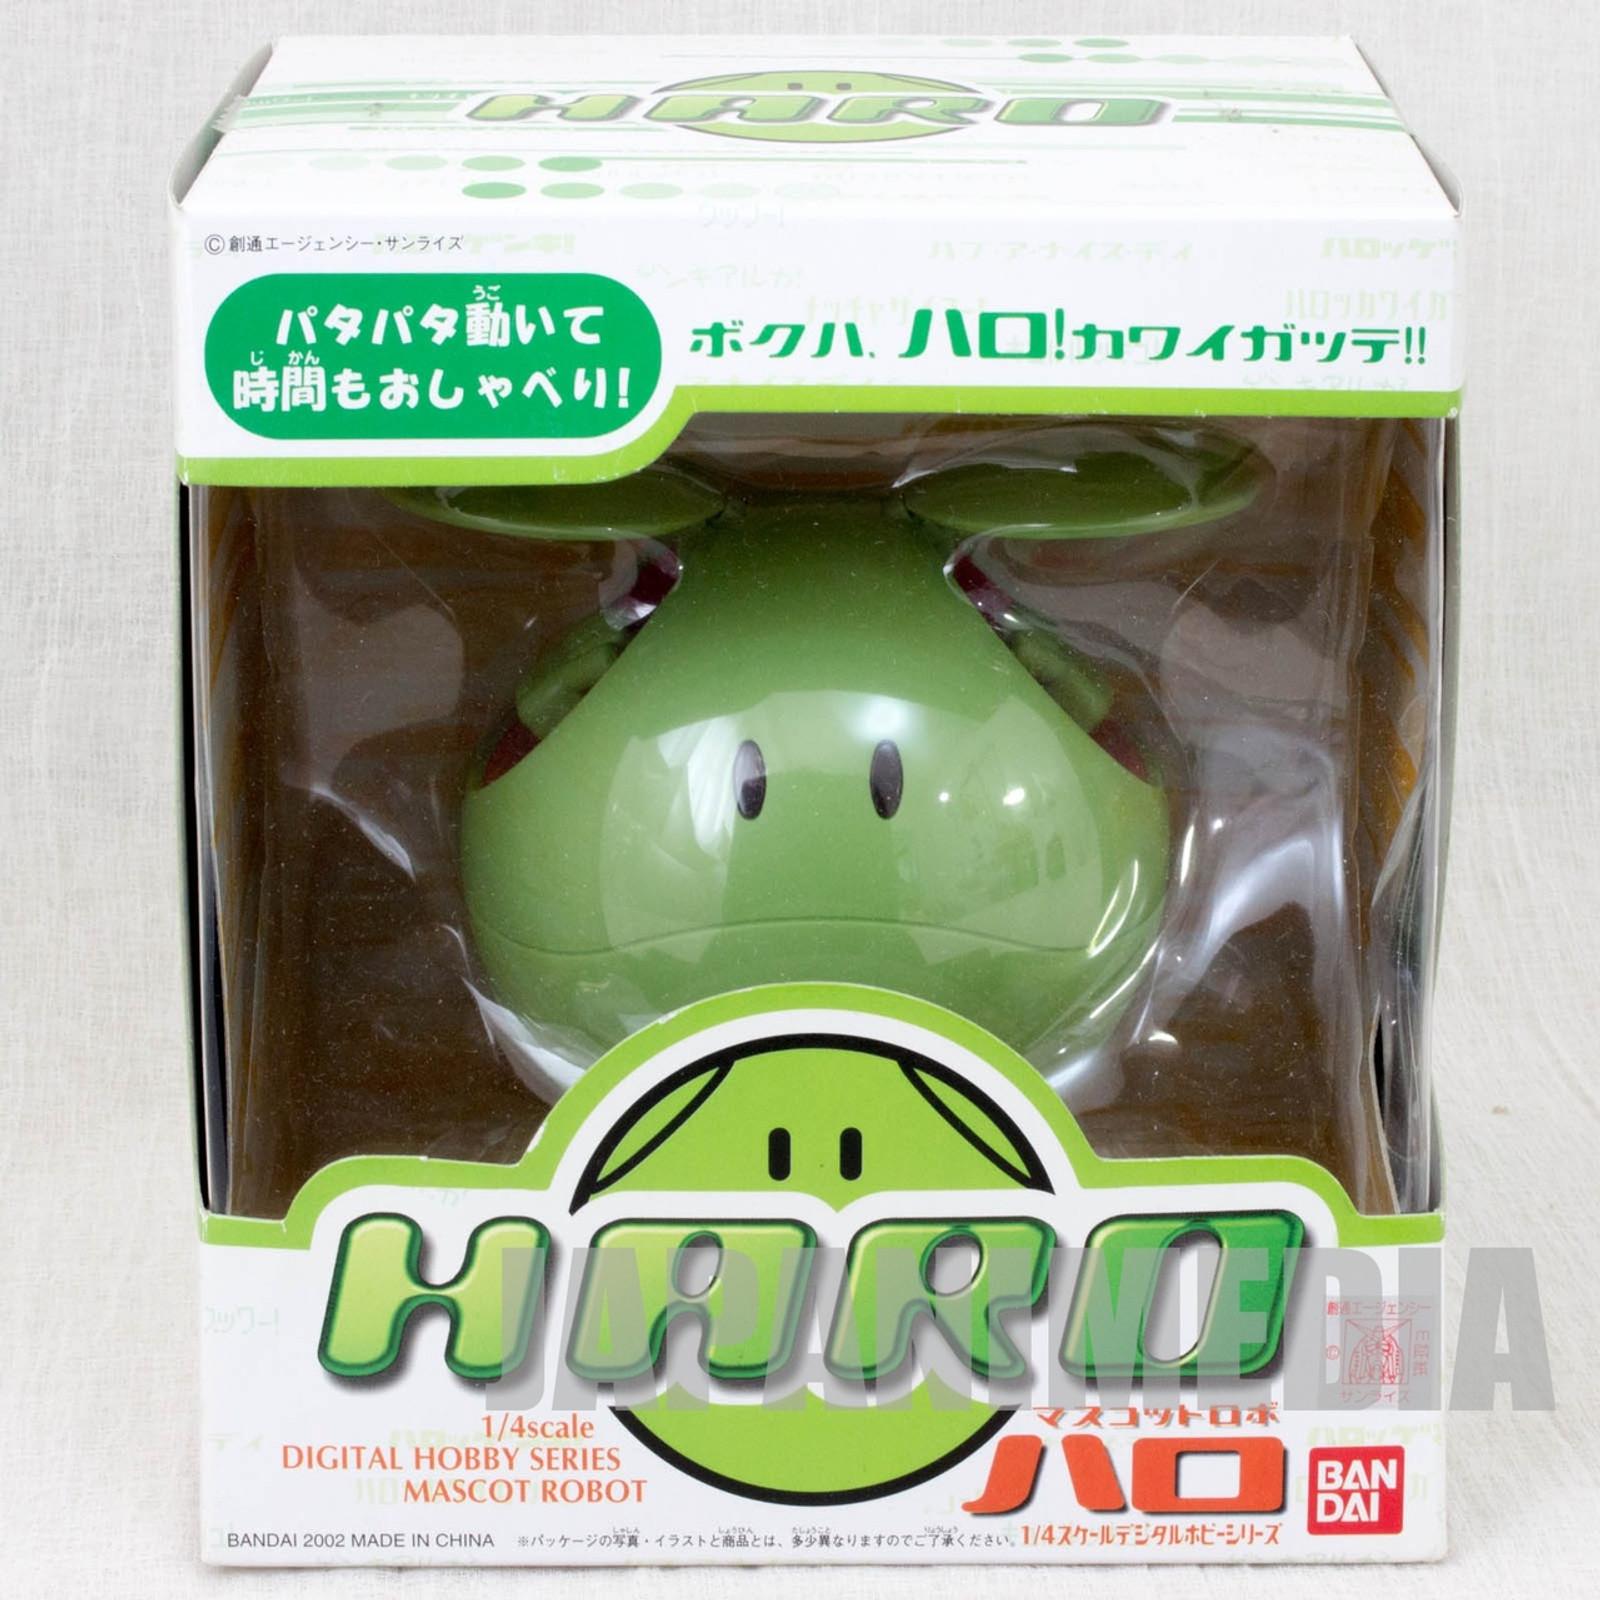 Gundam Mascot Robot HARO Talking Figure Scale 1/4 Green Bandai JAPAN ANIME